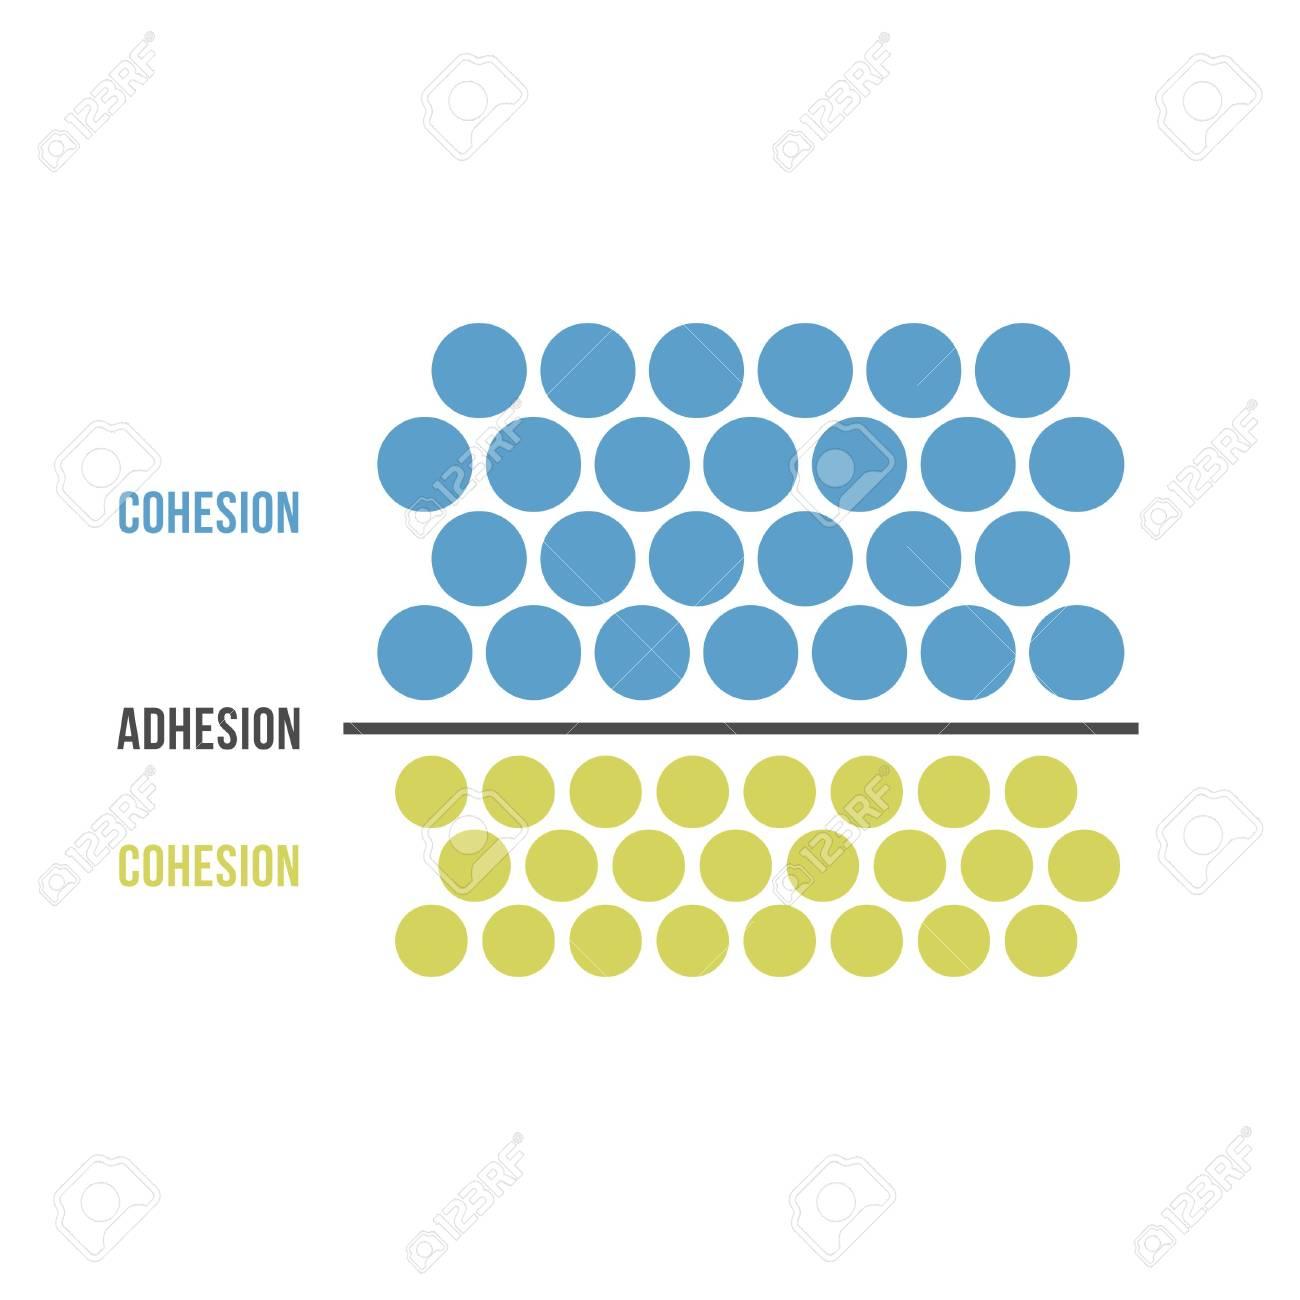 Cohesion and Adhesion - 105713812